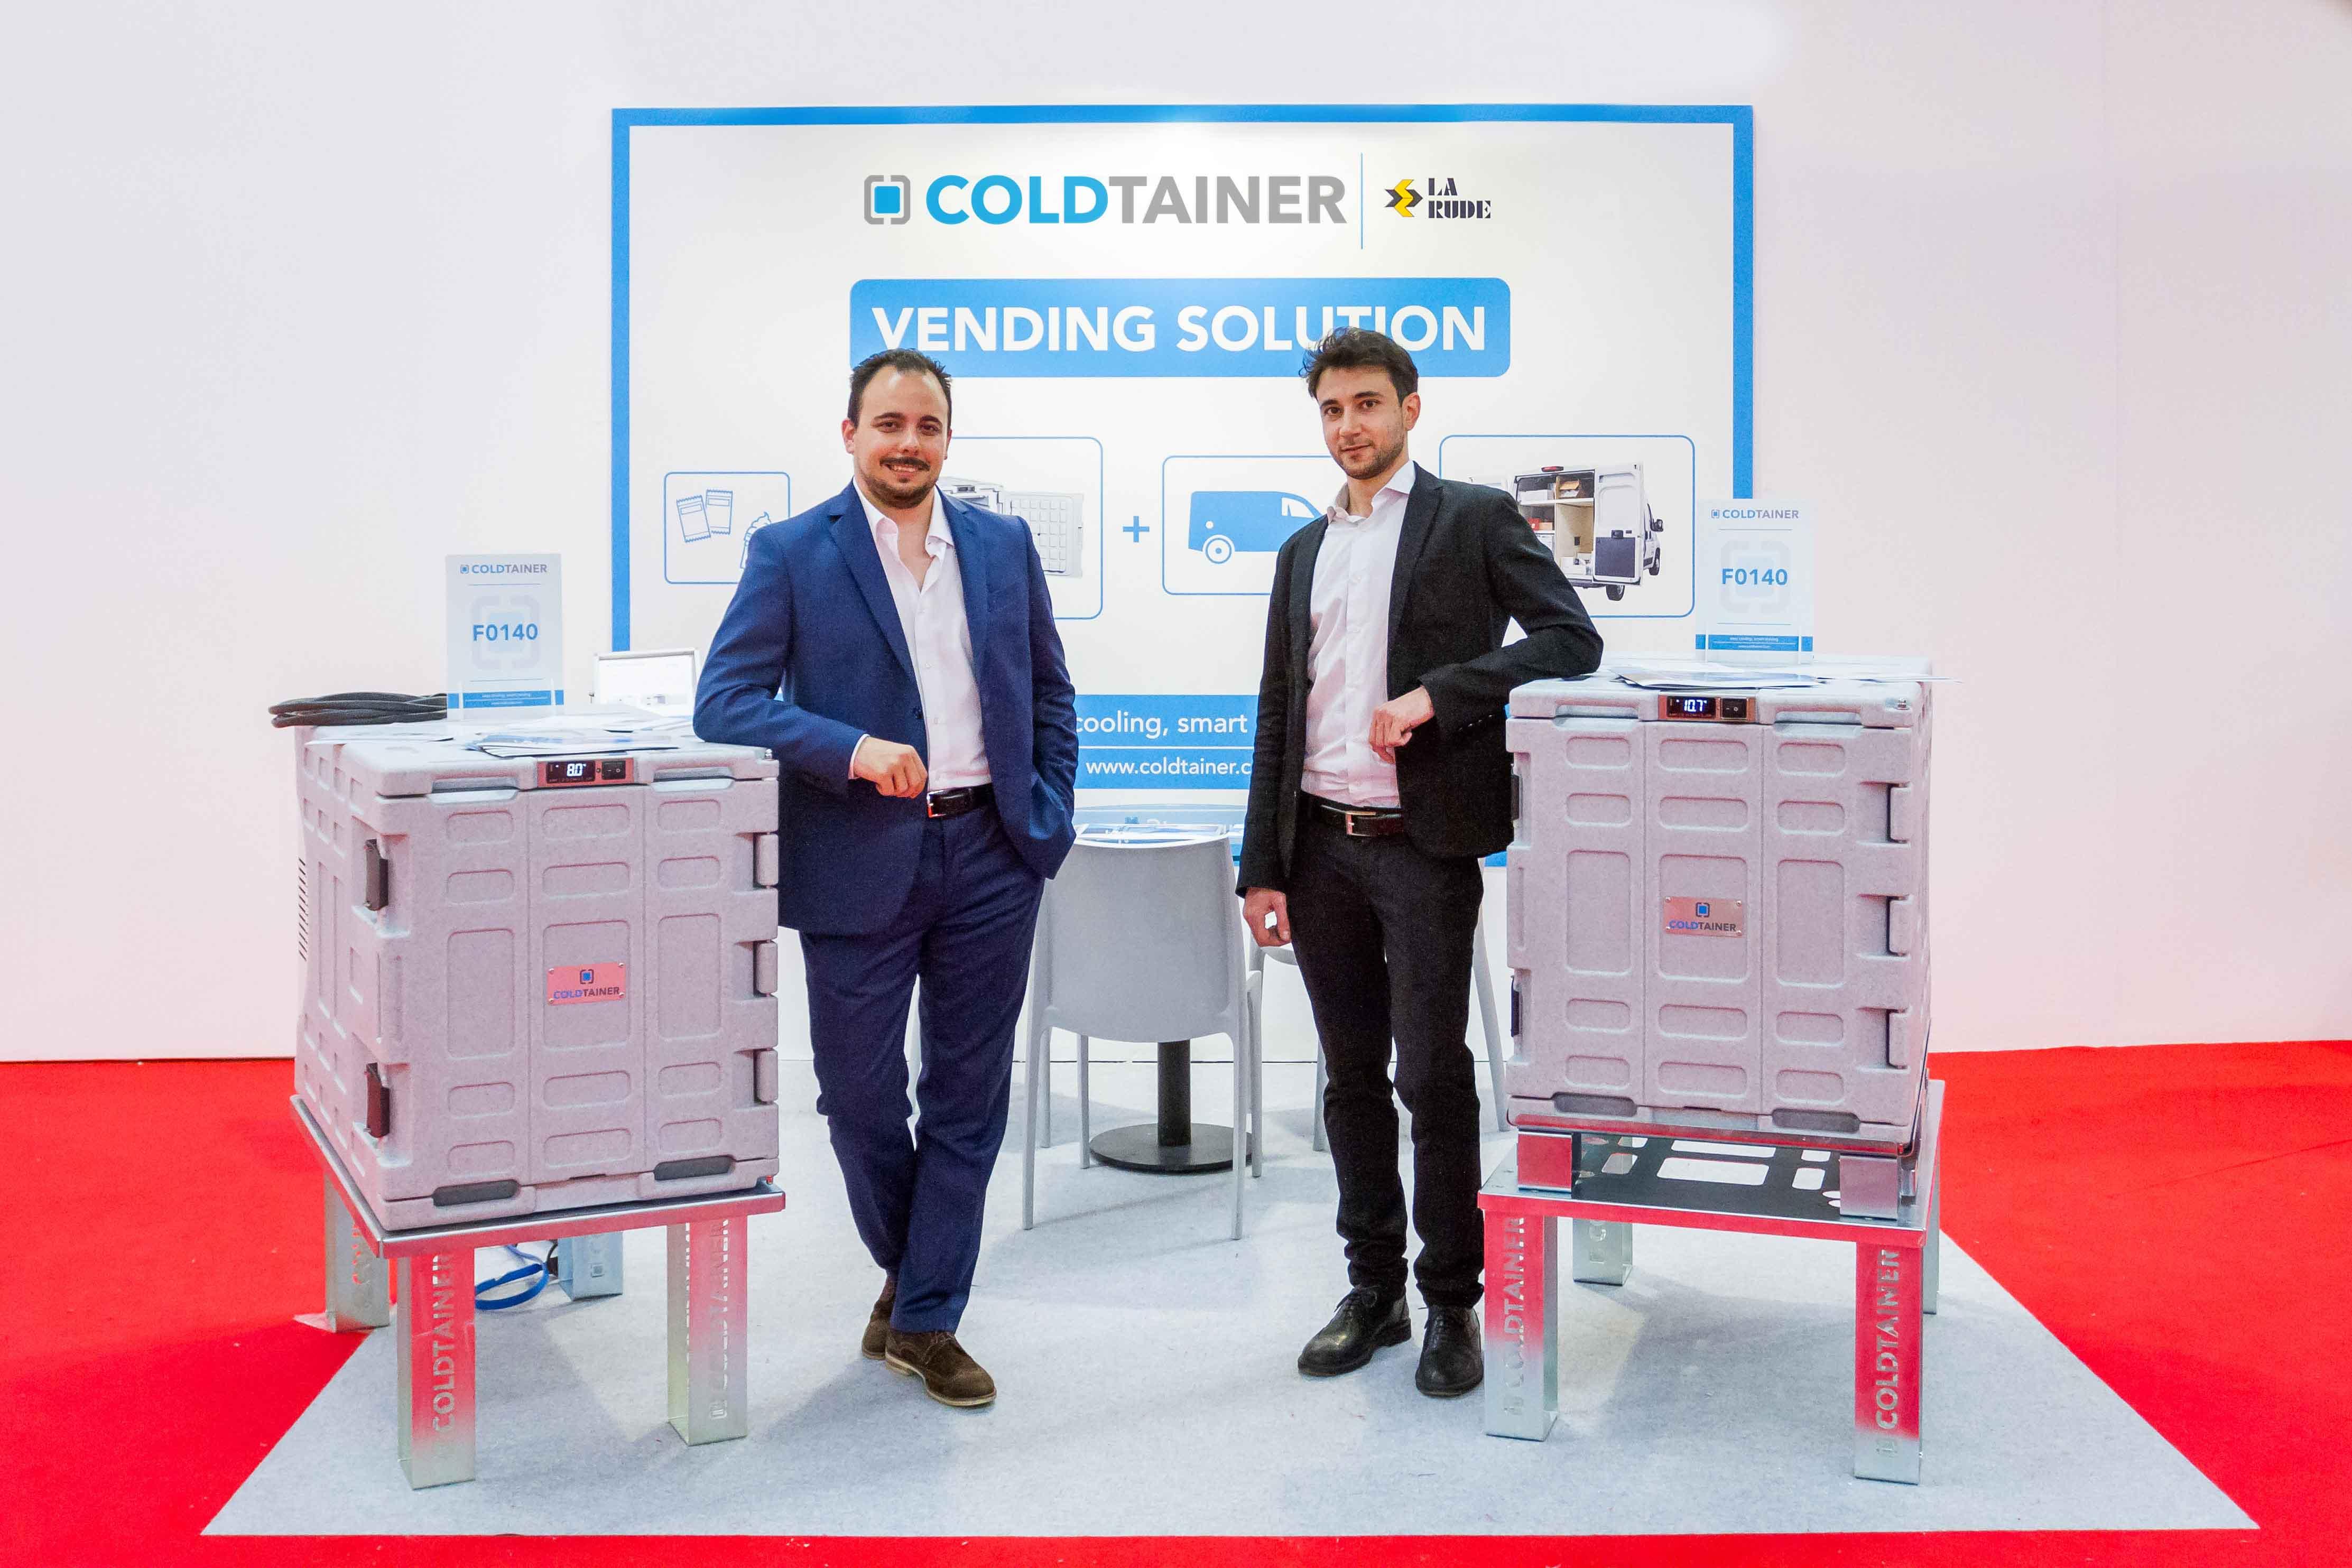 coldtainer venditalia